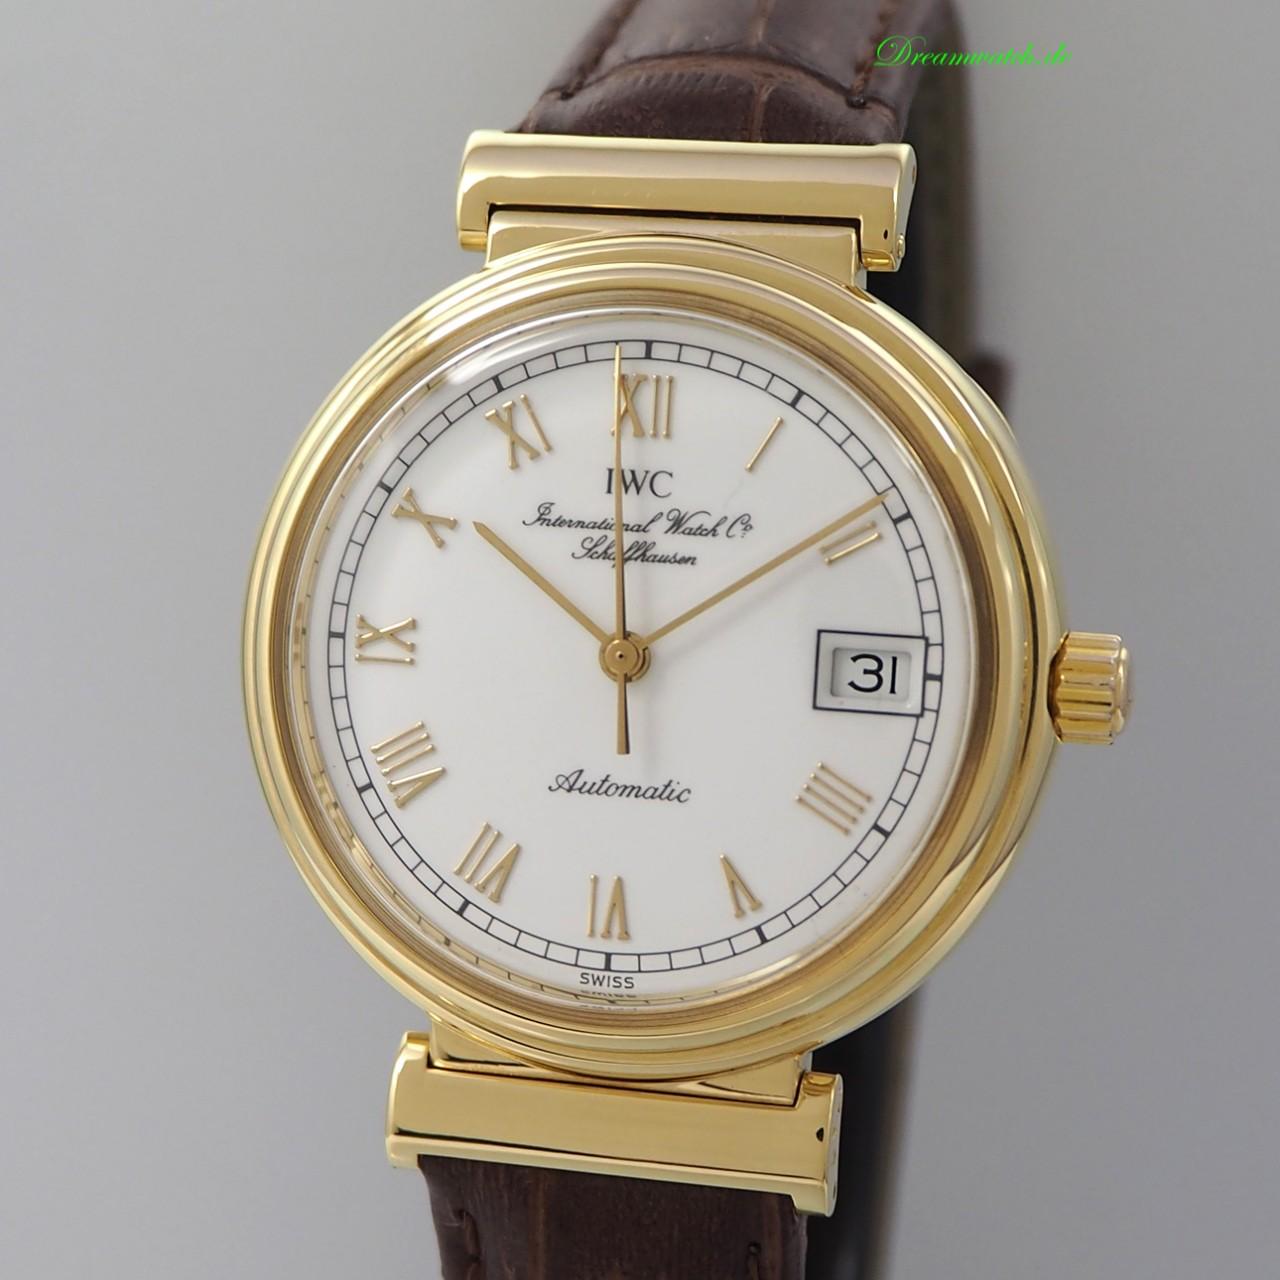 IWC Da-Vinci Automatik Ref.: 1850 -18k/750 Gold/ Leder